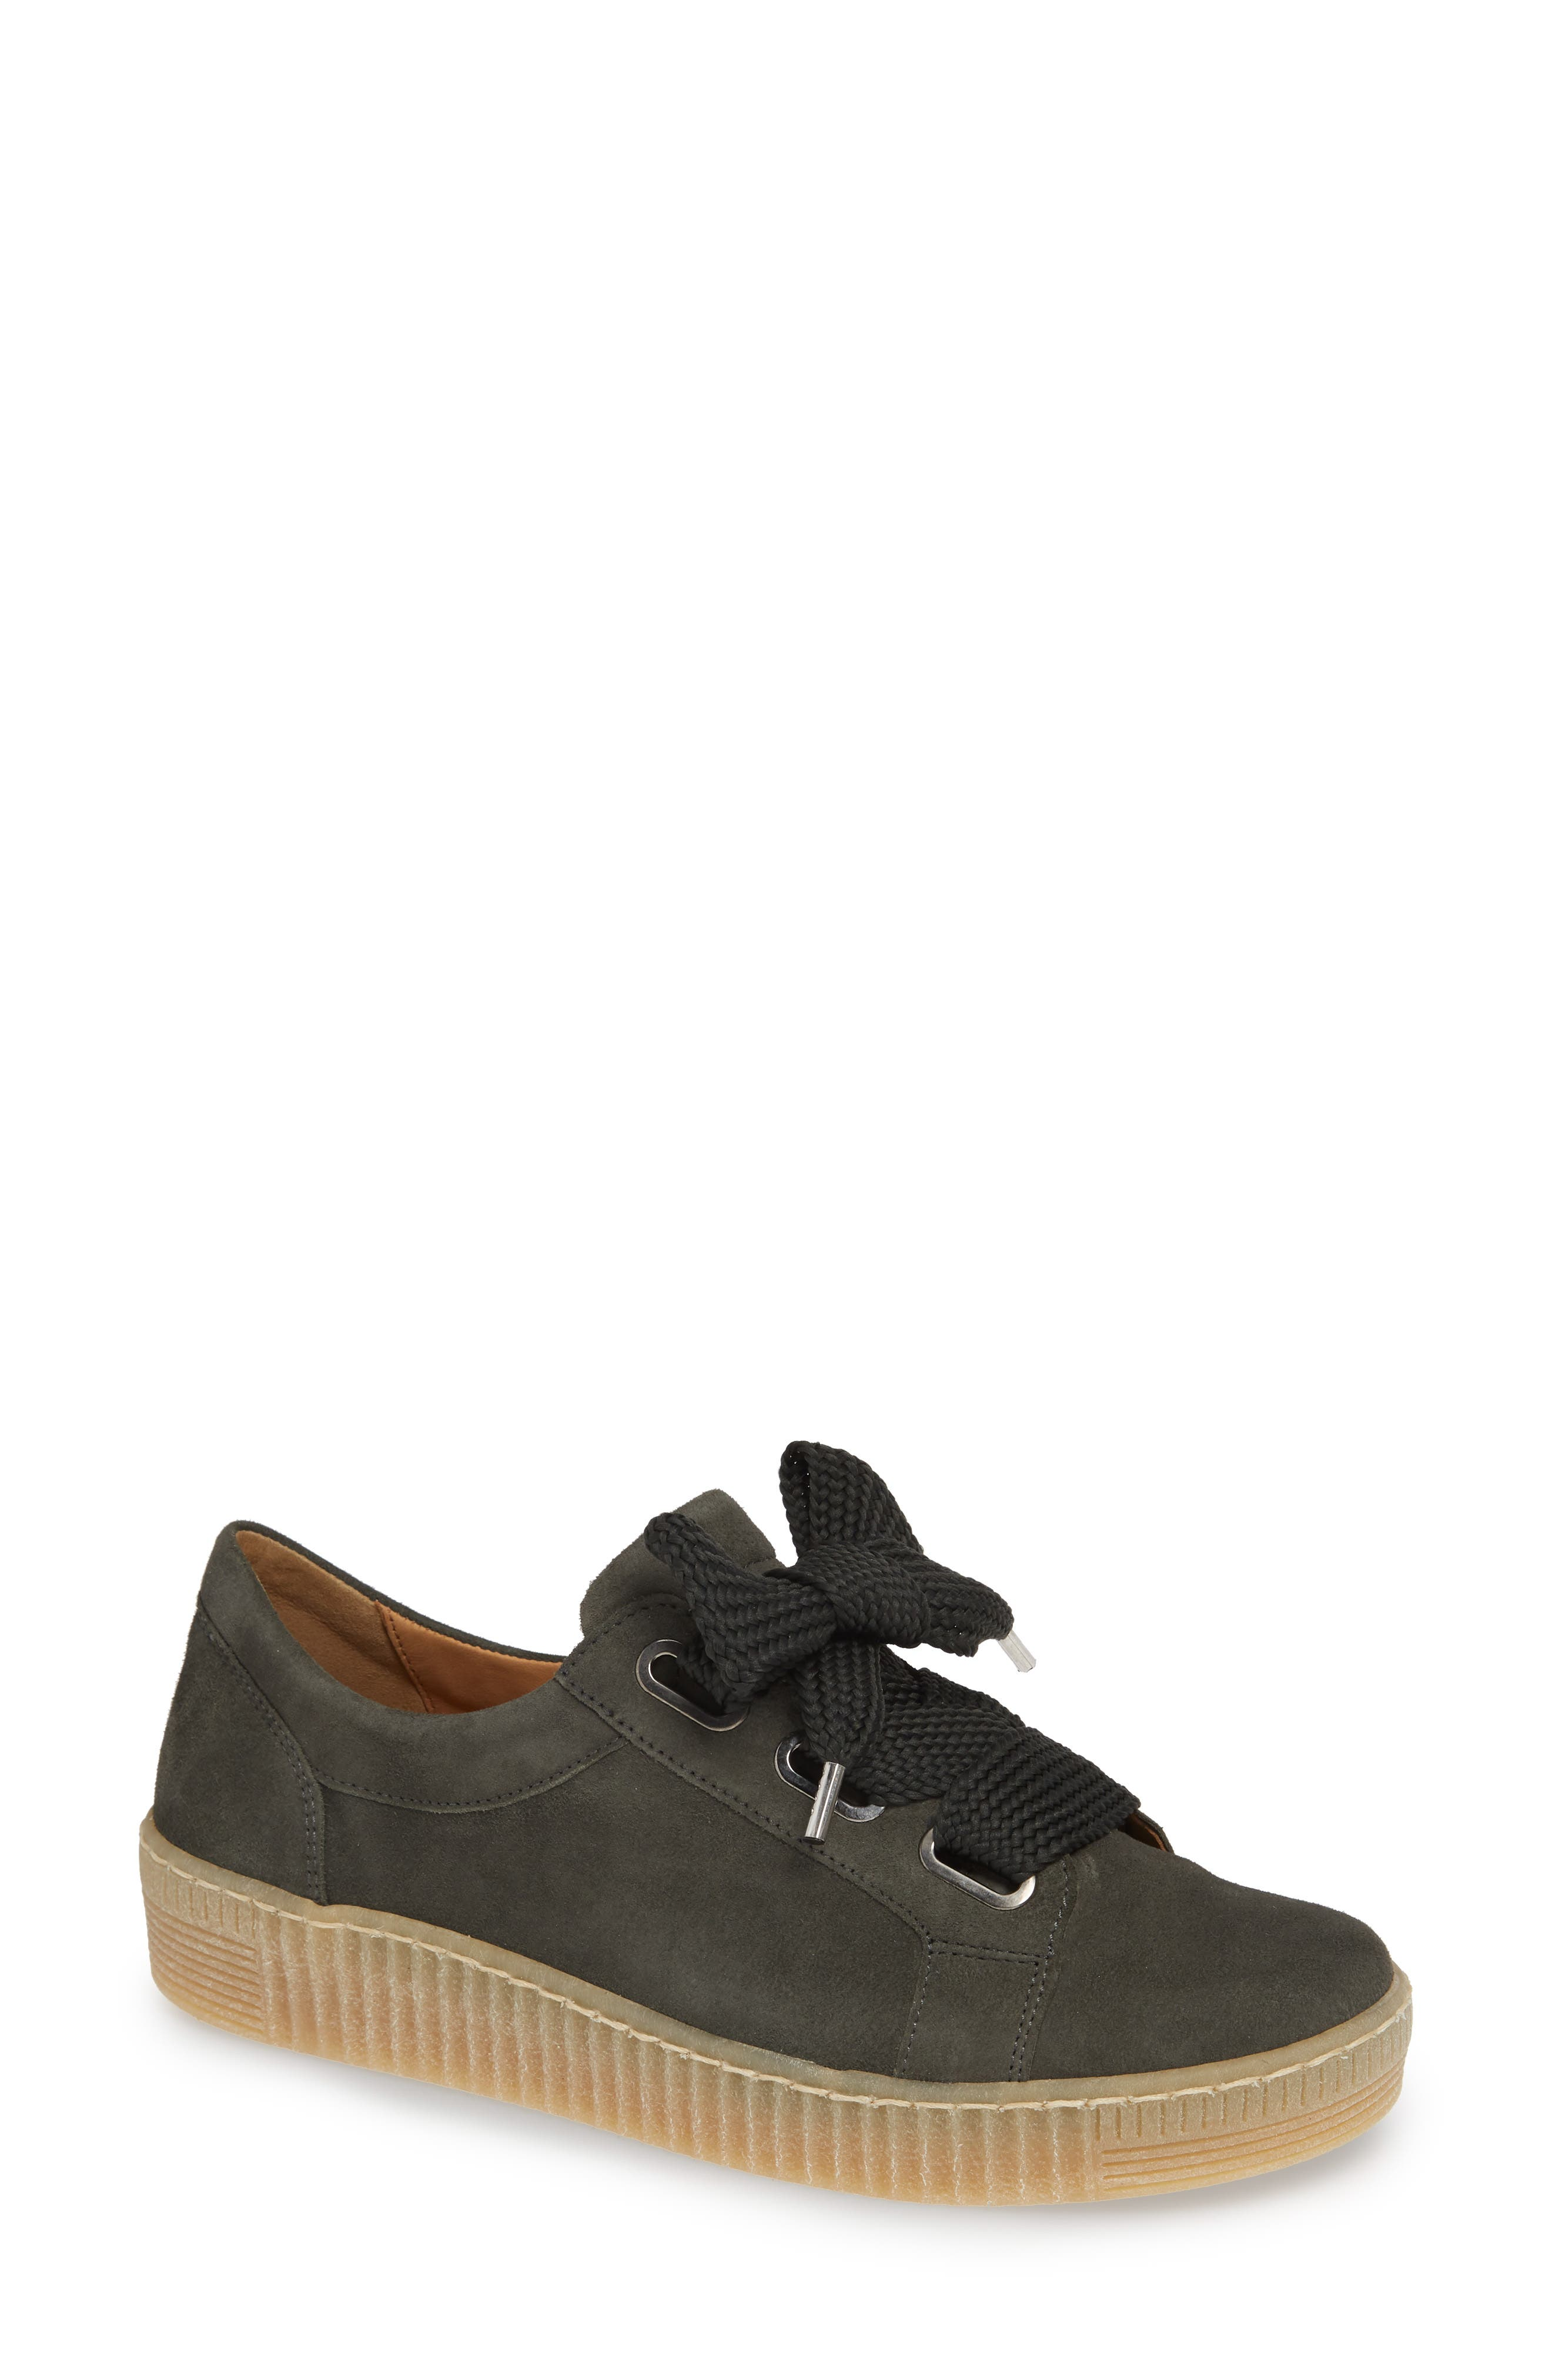 Gabor Sneaker, Grey